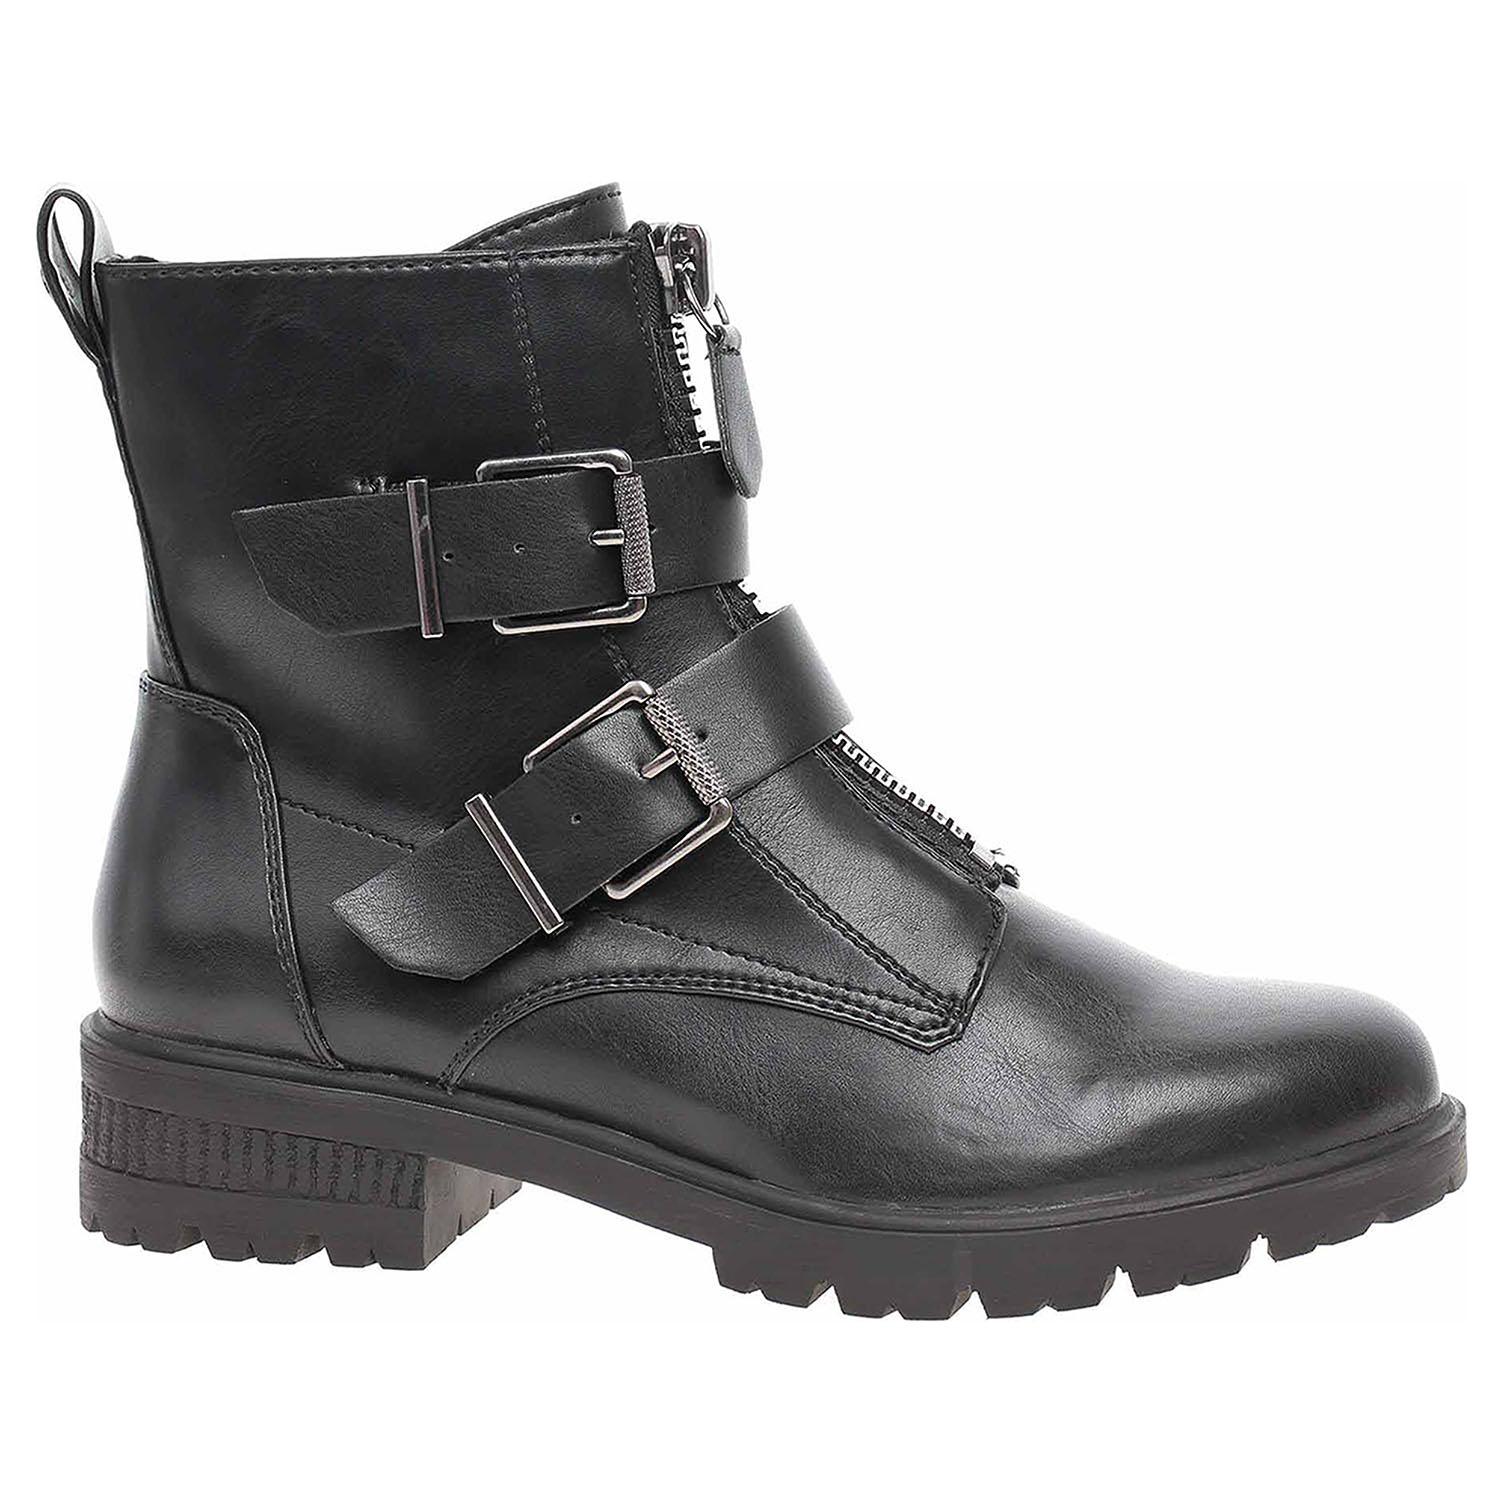 Dámská kotníková obuv Tamaris 1-25414-23 black matt 1-1-25414-23 020 39